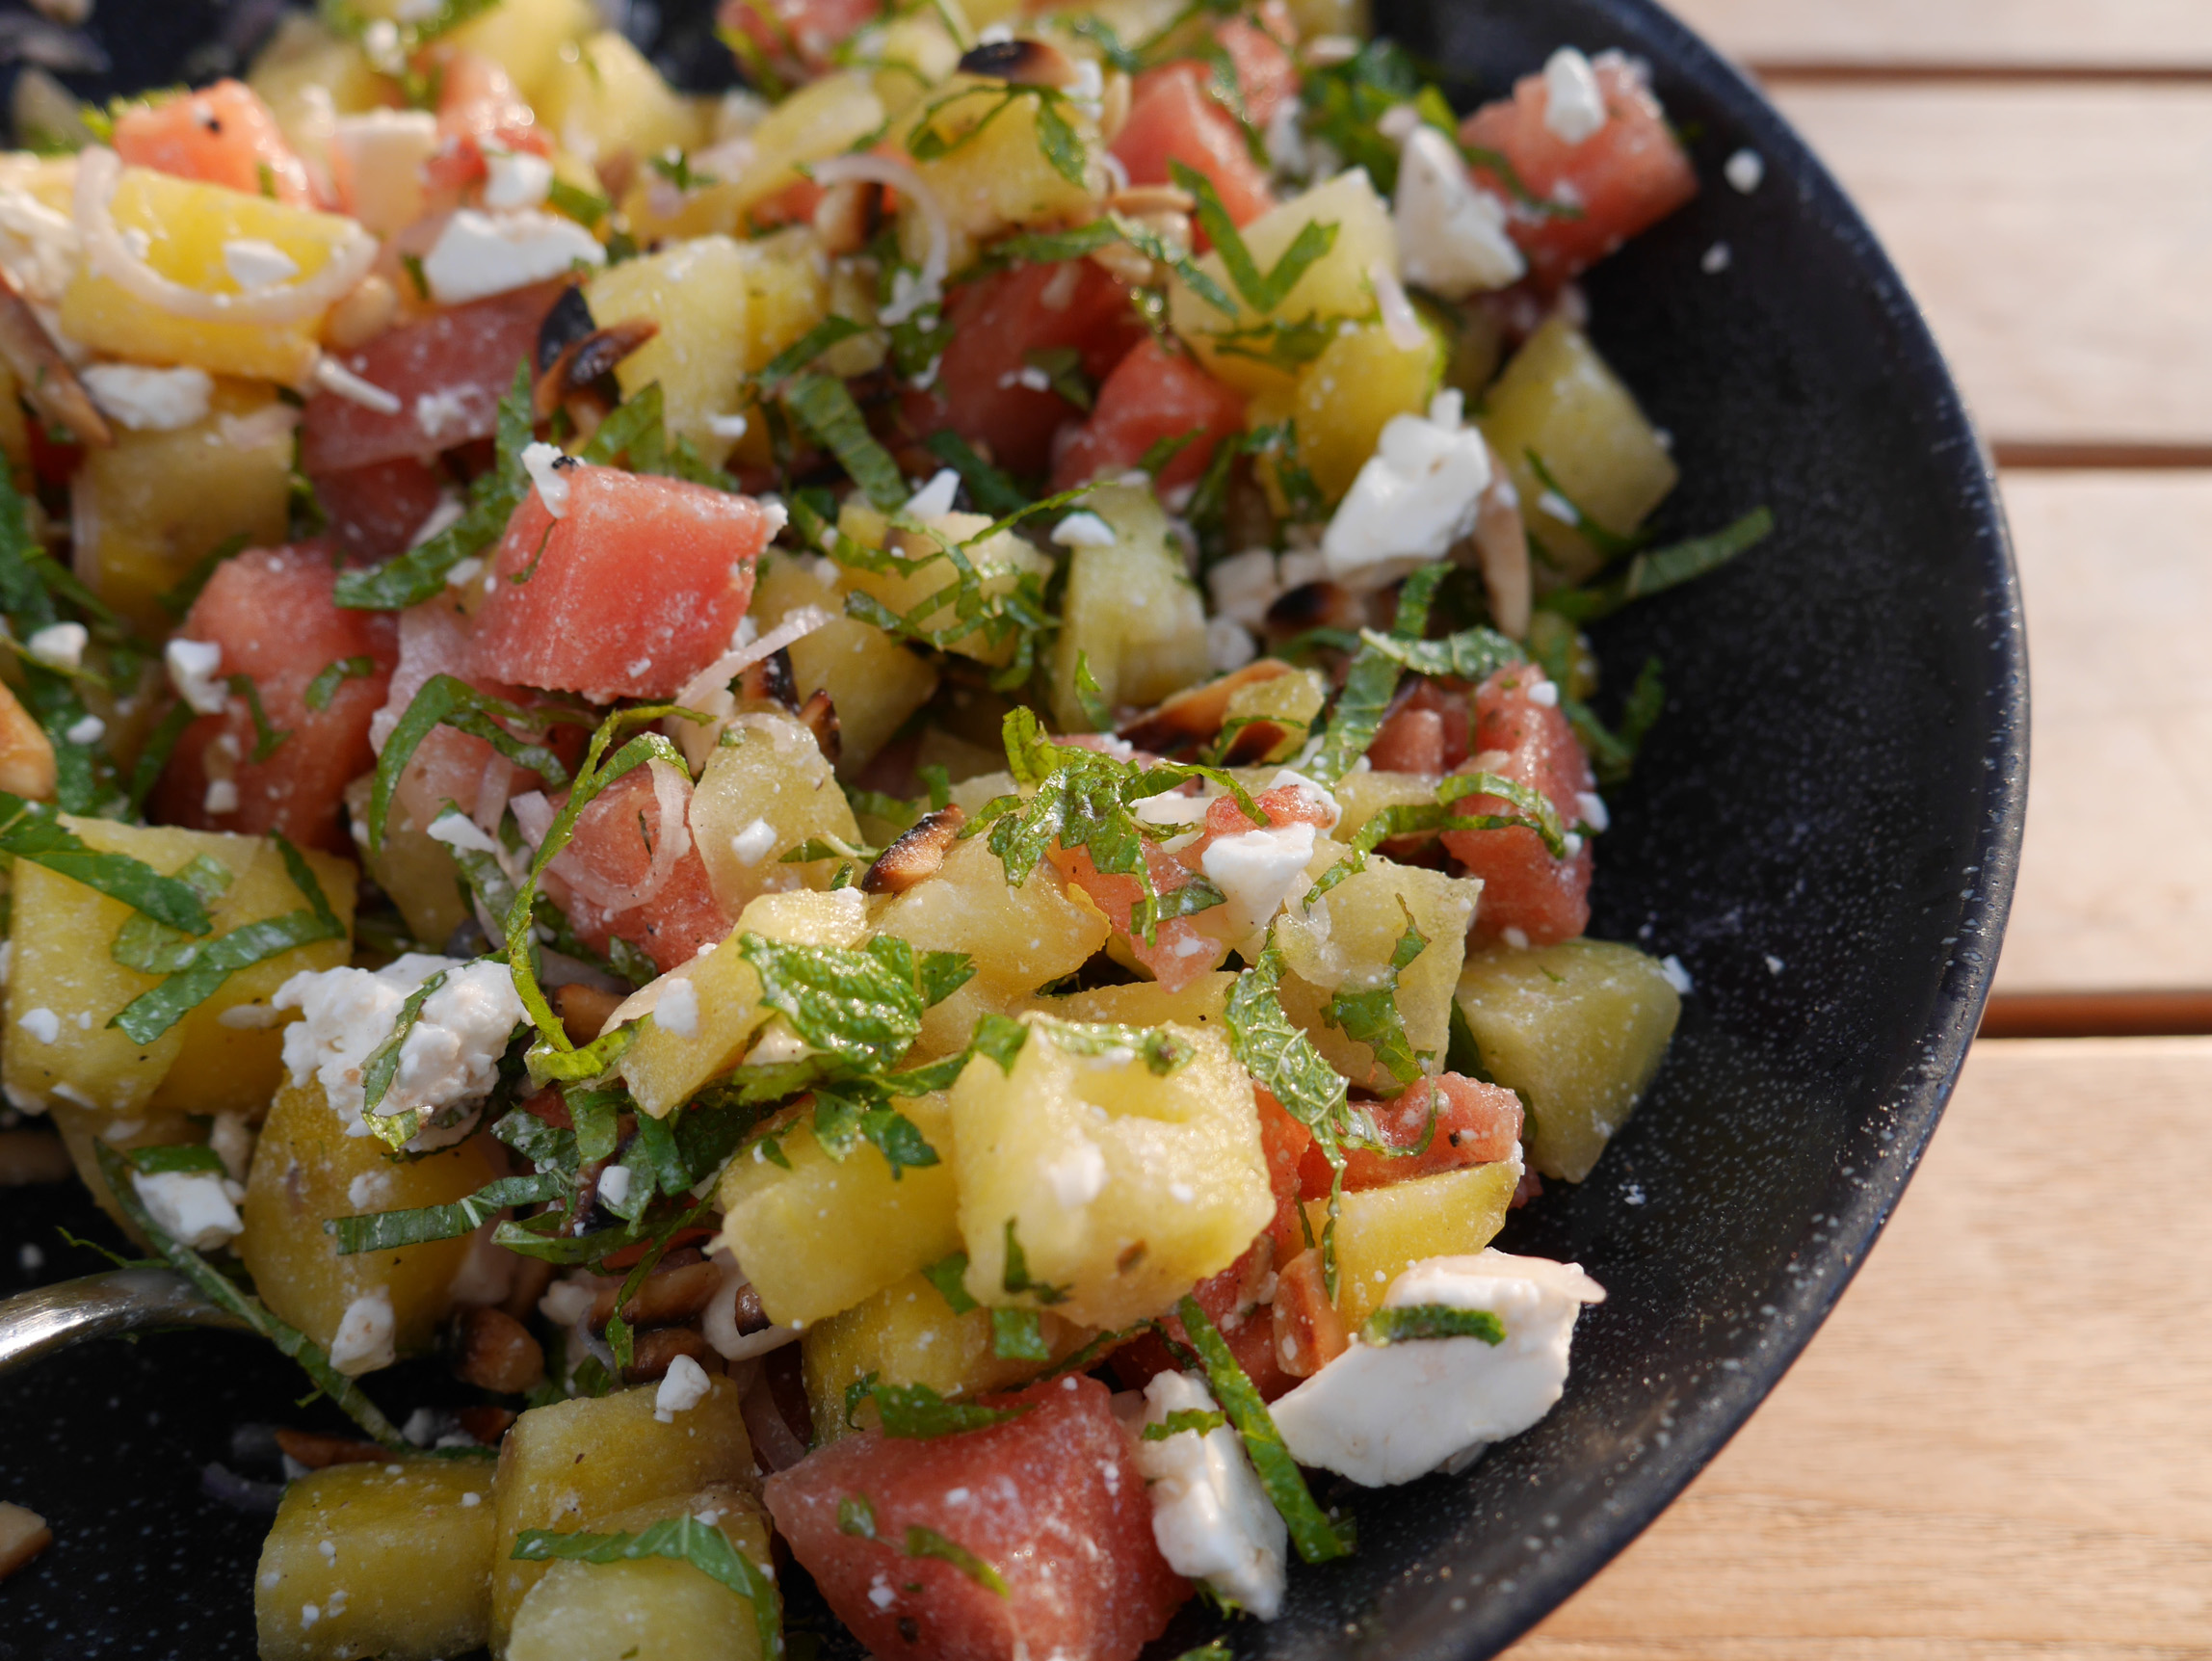 Bunter Melonensalat